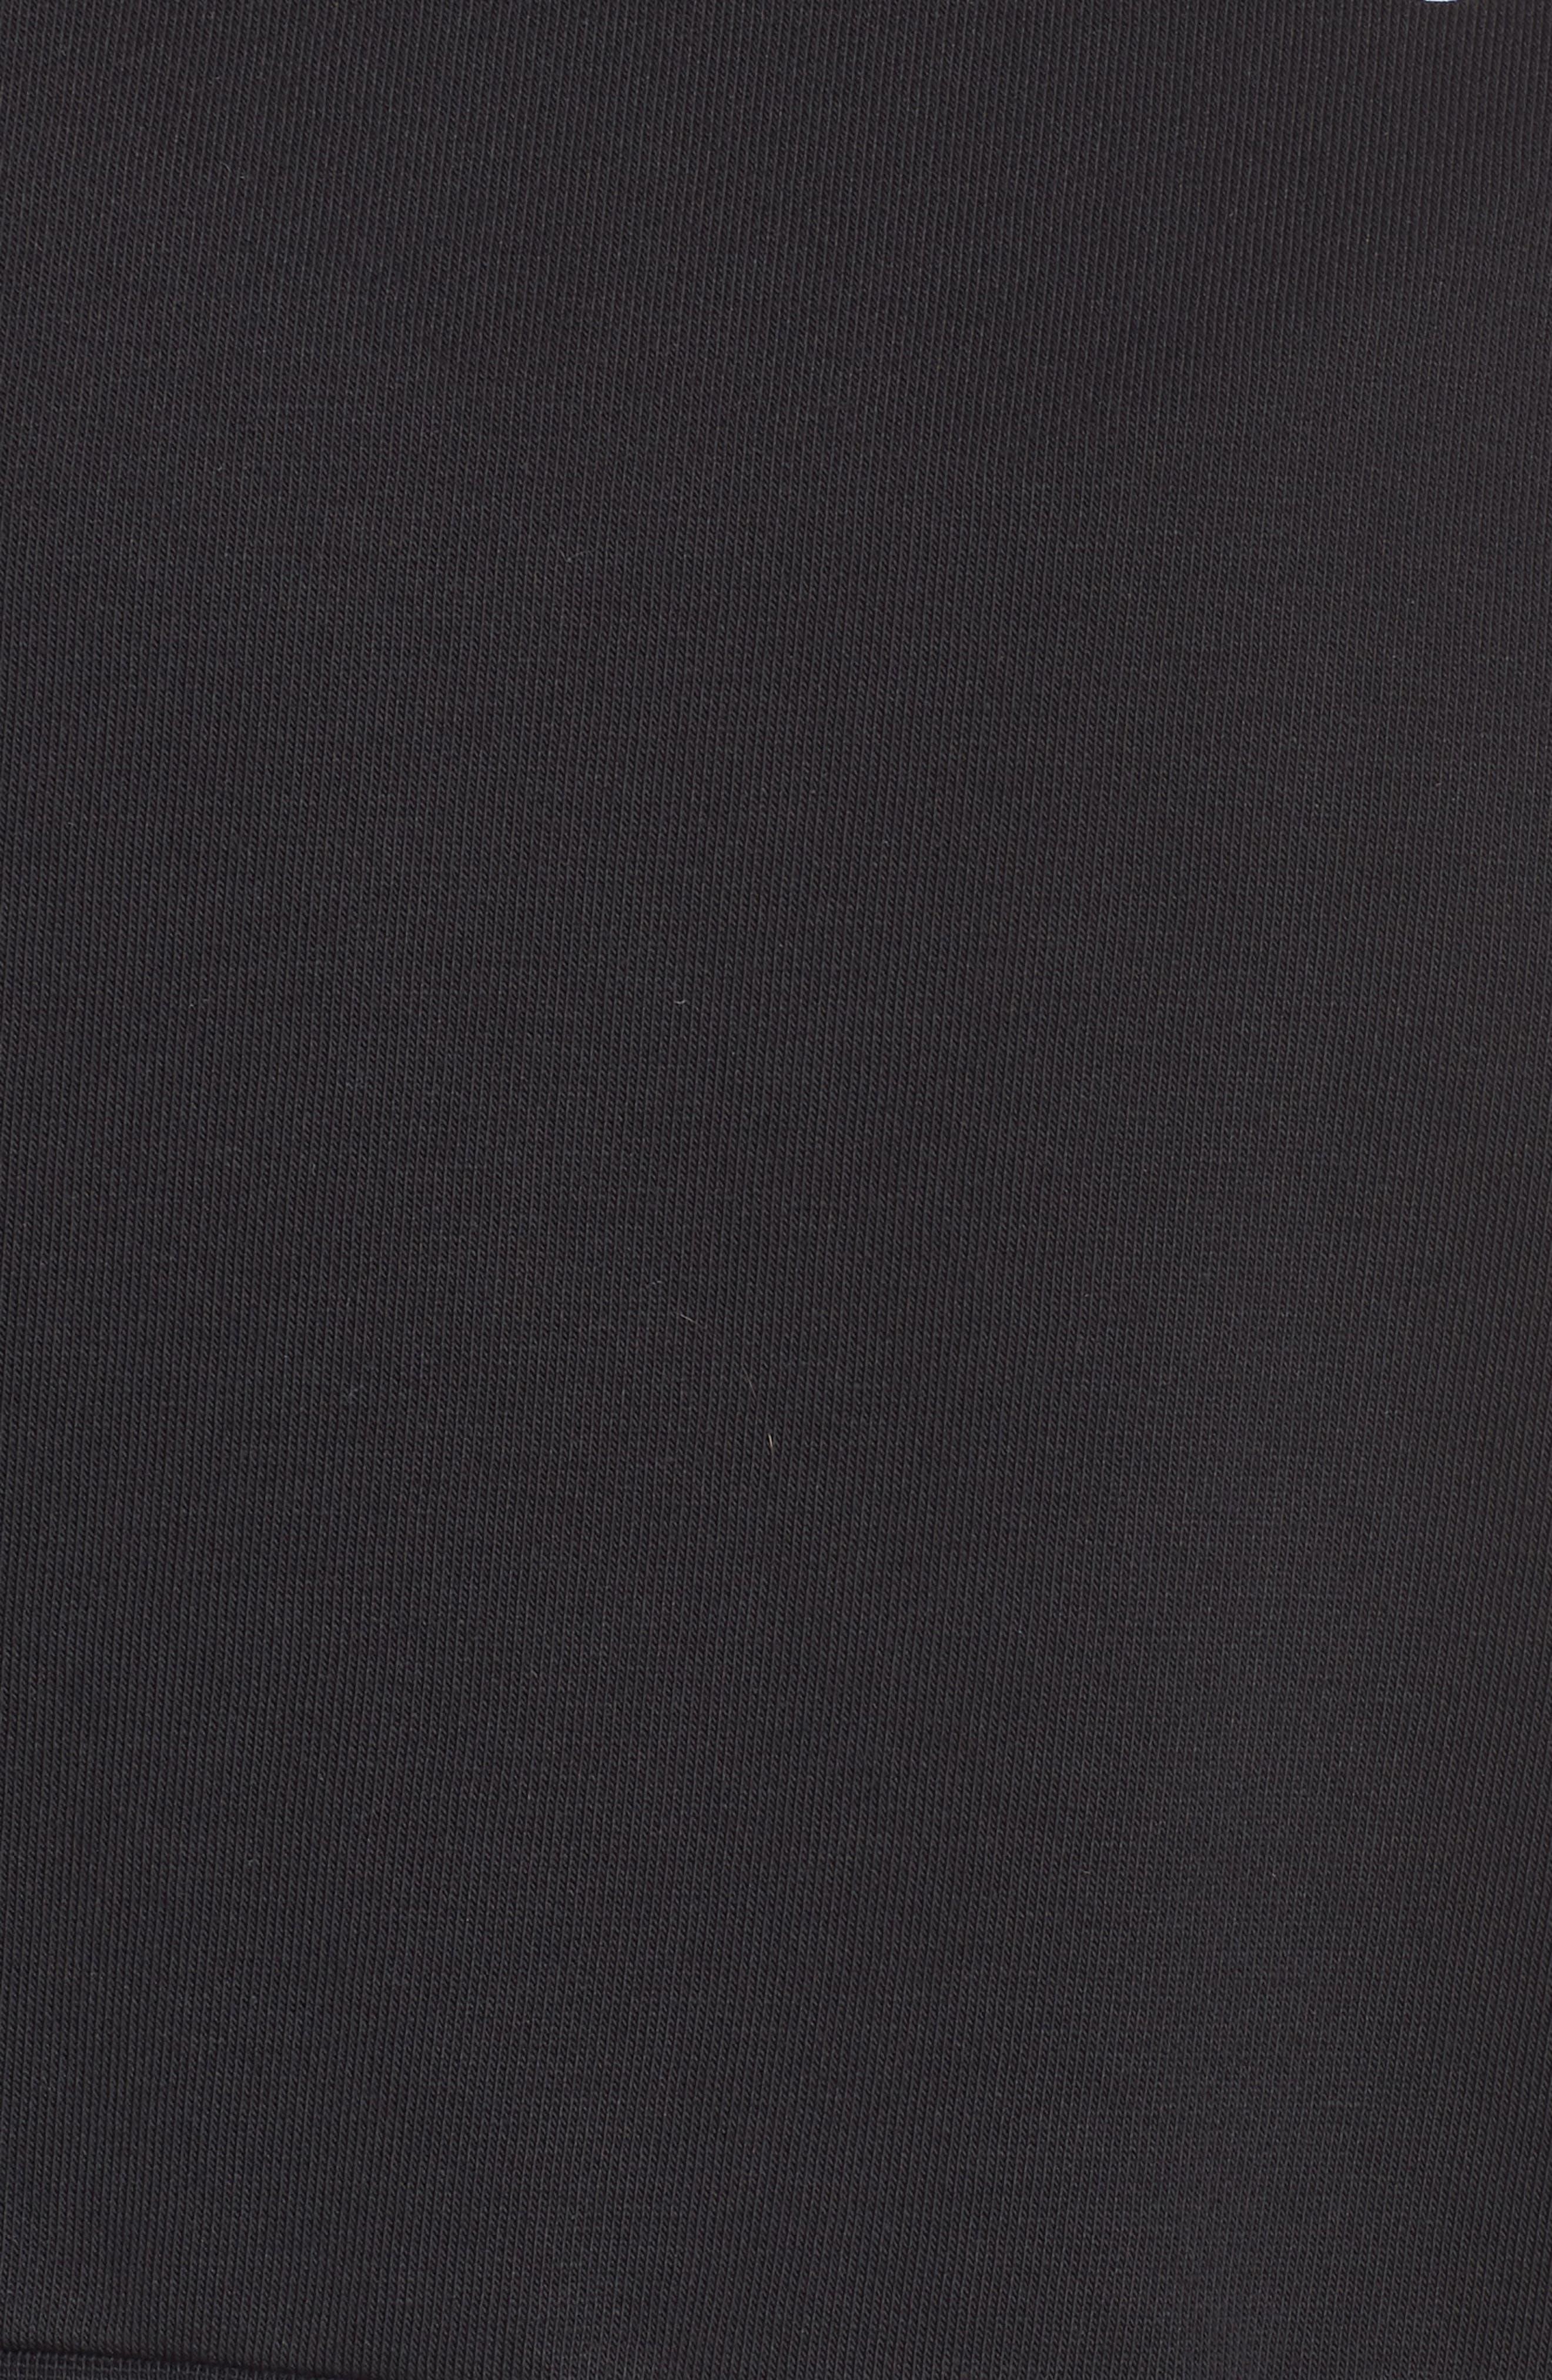 NIKE, Dry Crop Training Sweatshirt, Alternate thumbnail 6, color, BLACK/ WHITE